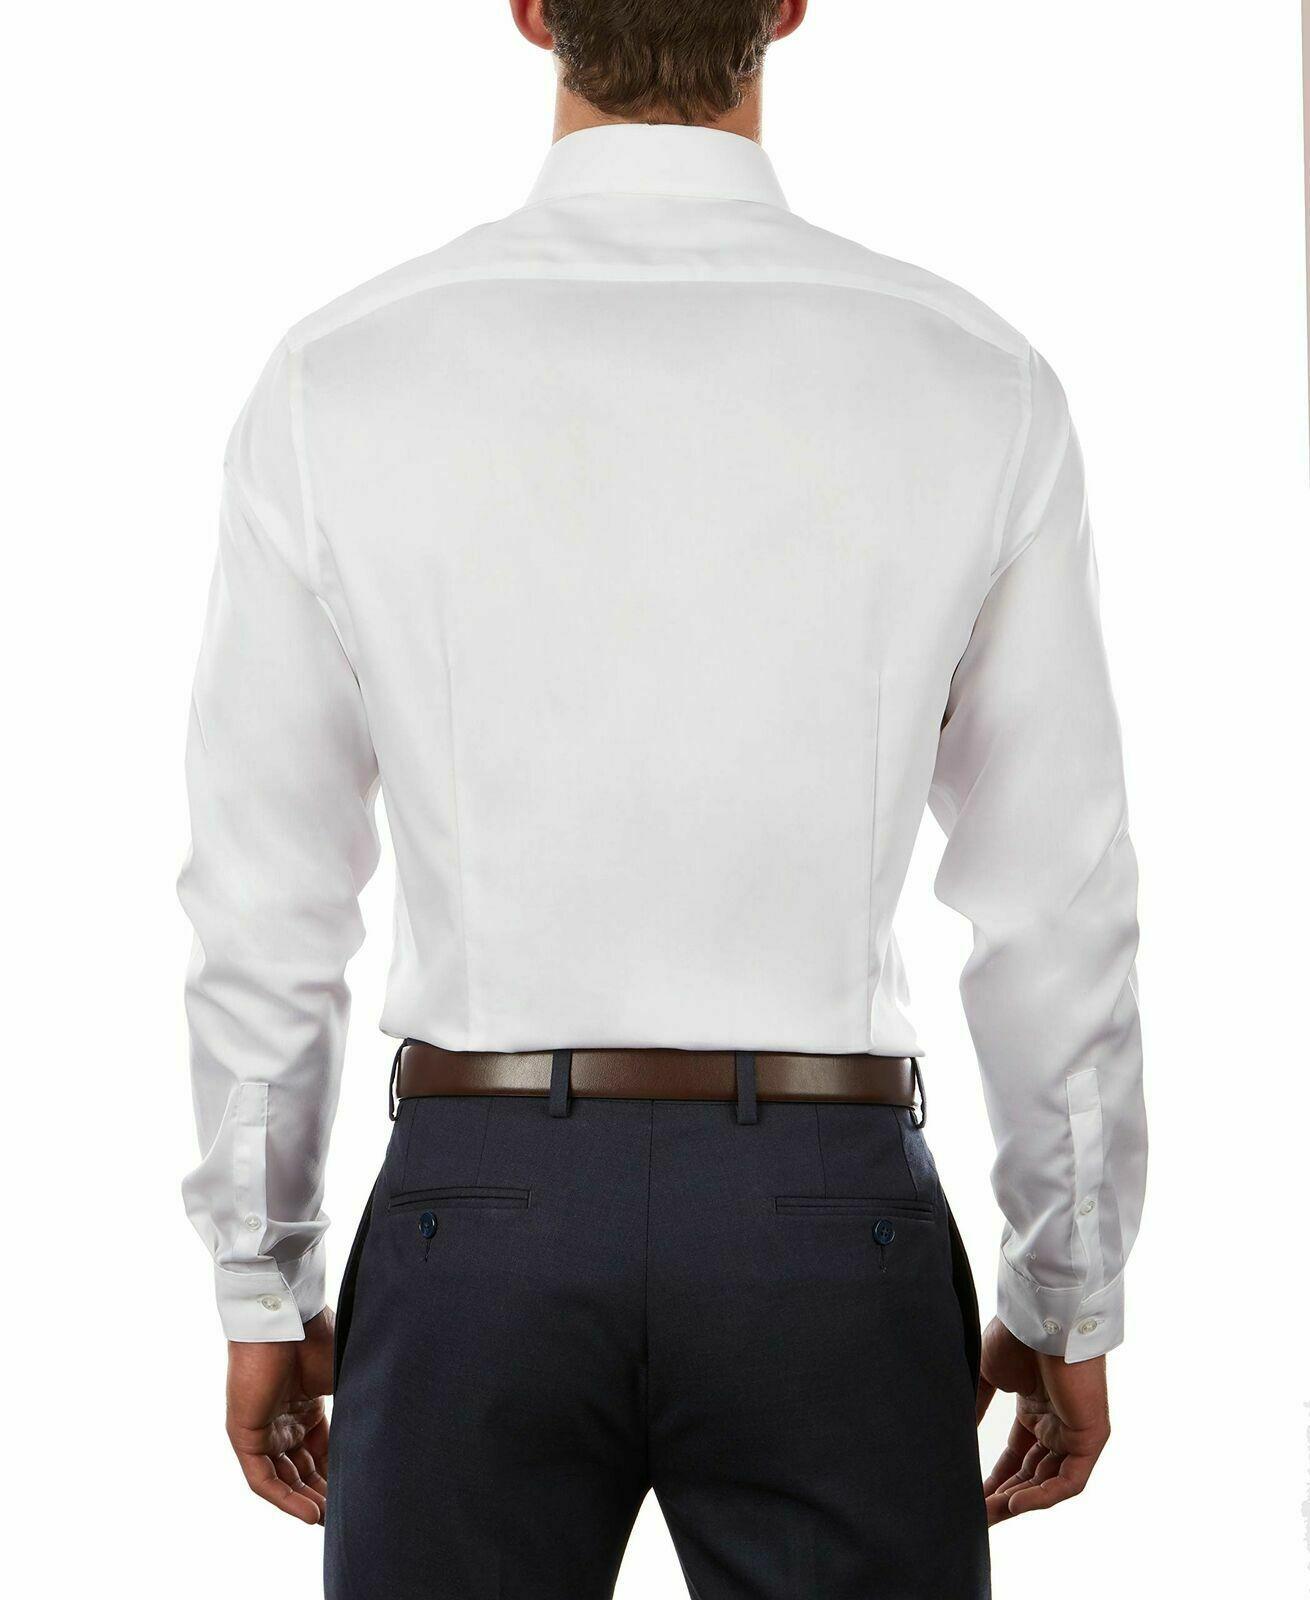 Calvin Klein Men Dress Shirt Classic White Size 13 1/2 Extreme Slim Fit SEALED!!